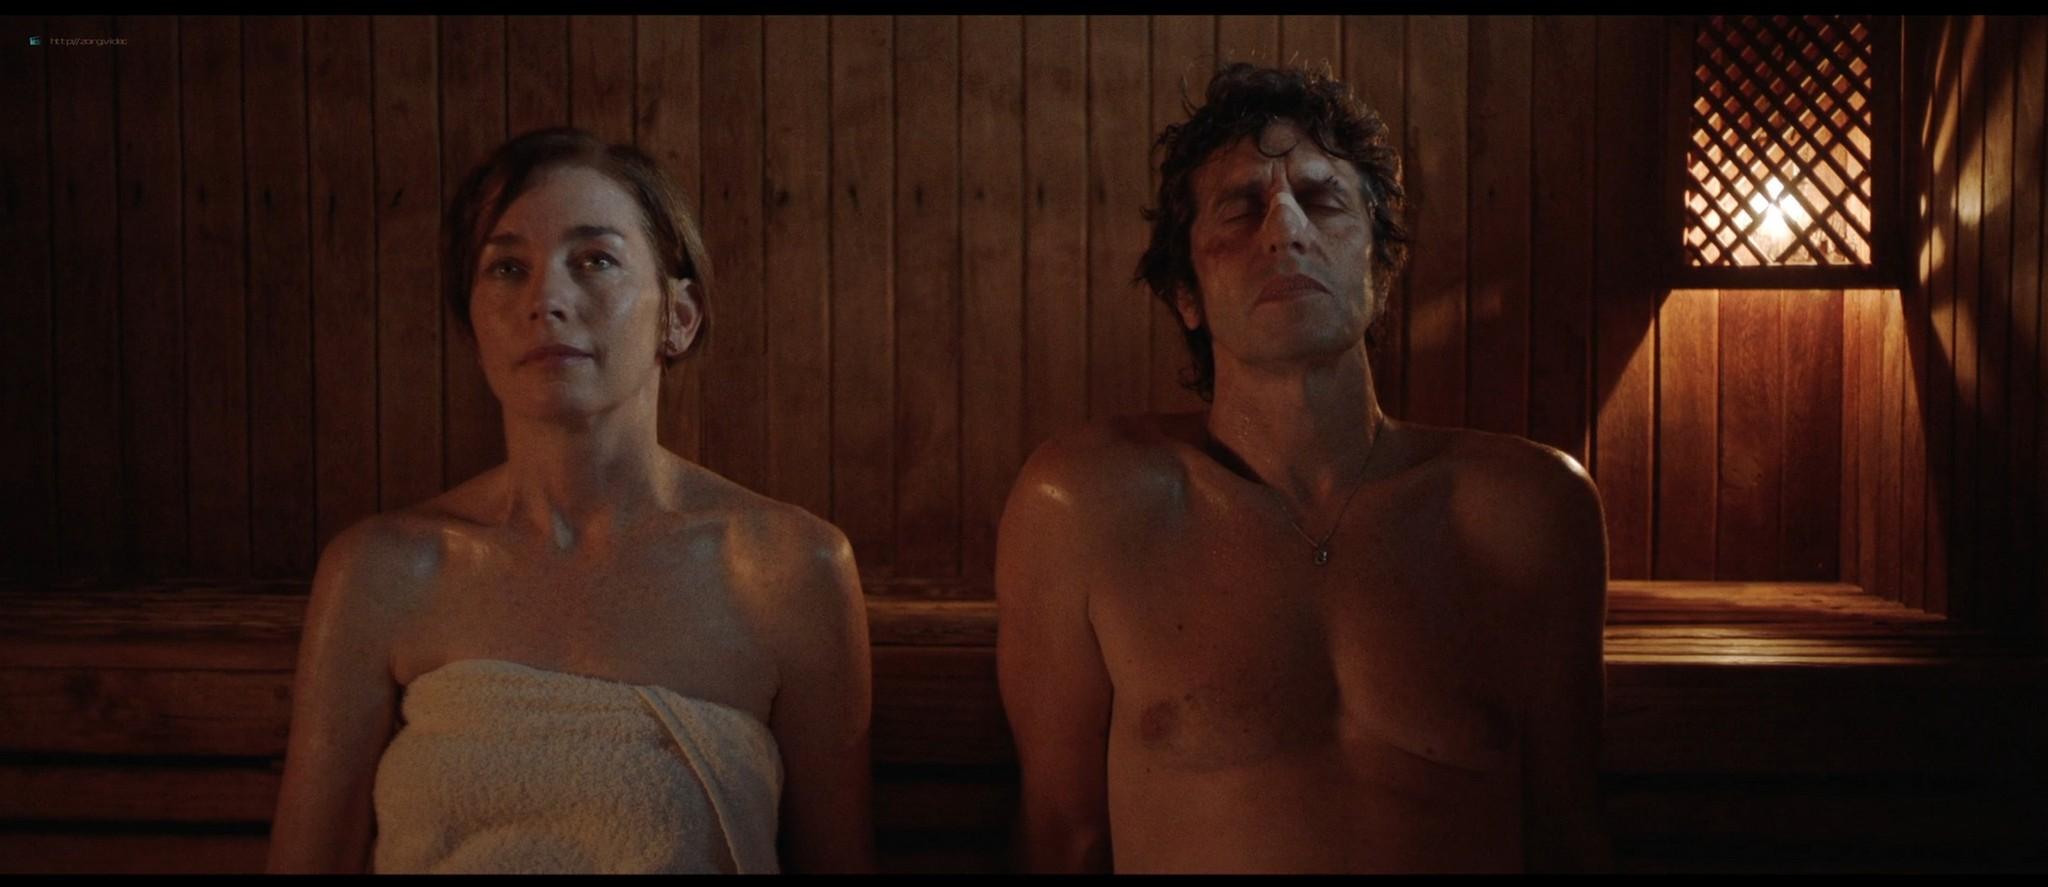 Julianne Nicholson nude sex Sabrina Alfonso nude too - Initials SG (AR-2019) HD 1080p Web (2)